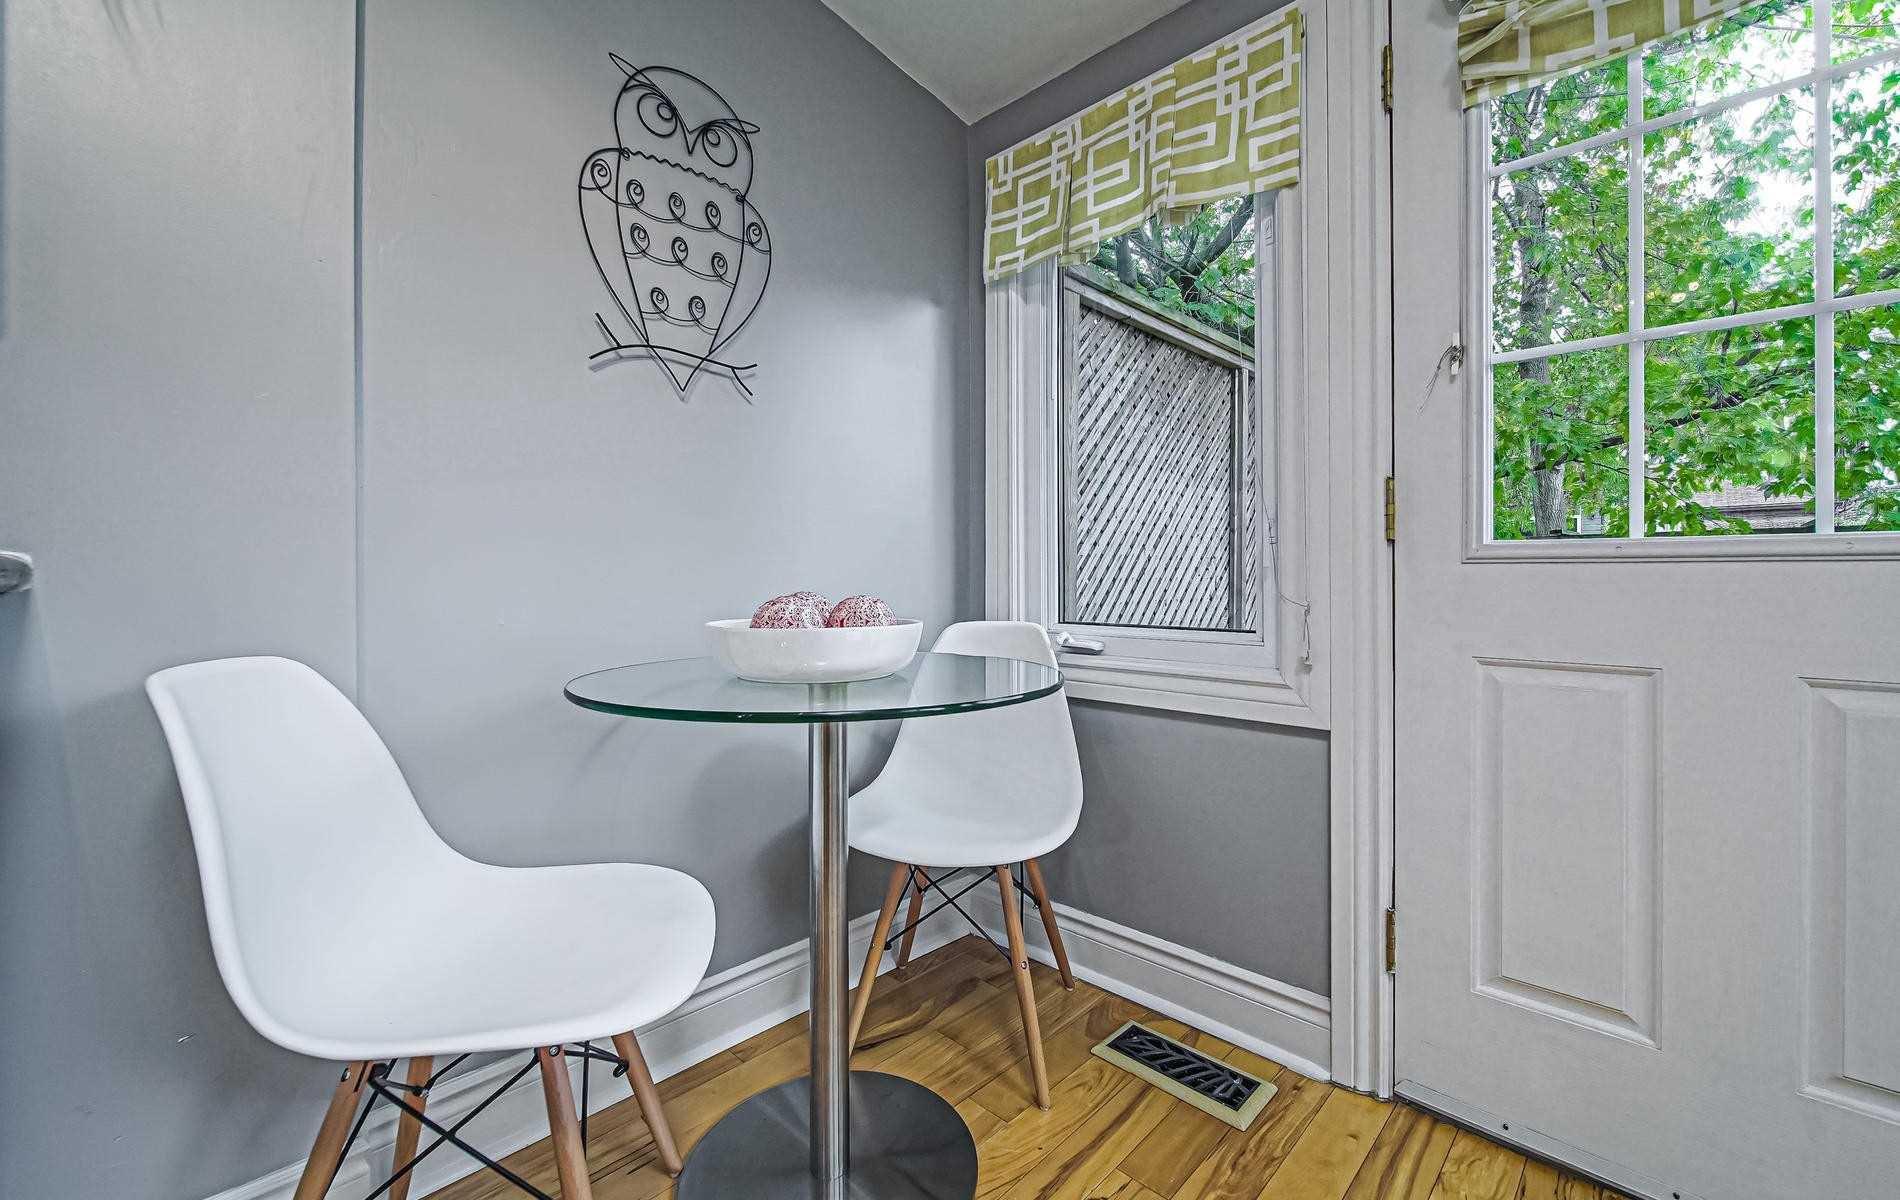 Photo 8: Photos: 84 Rushbrooke Avenue in Toronto: South Riverdale House (2-Storey) for sale (Toronto E01)  : MLS®# E4600791